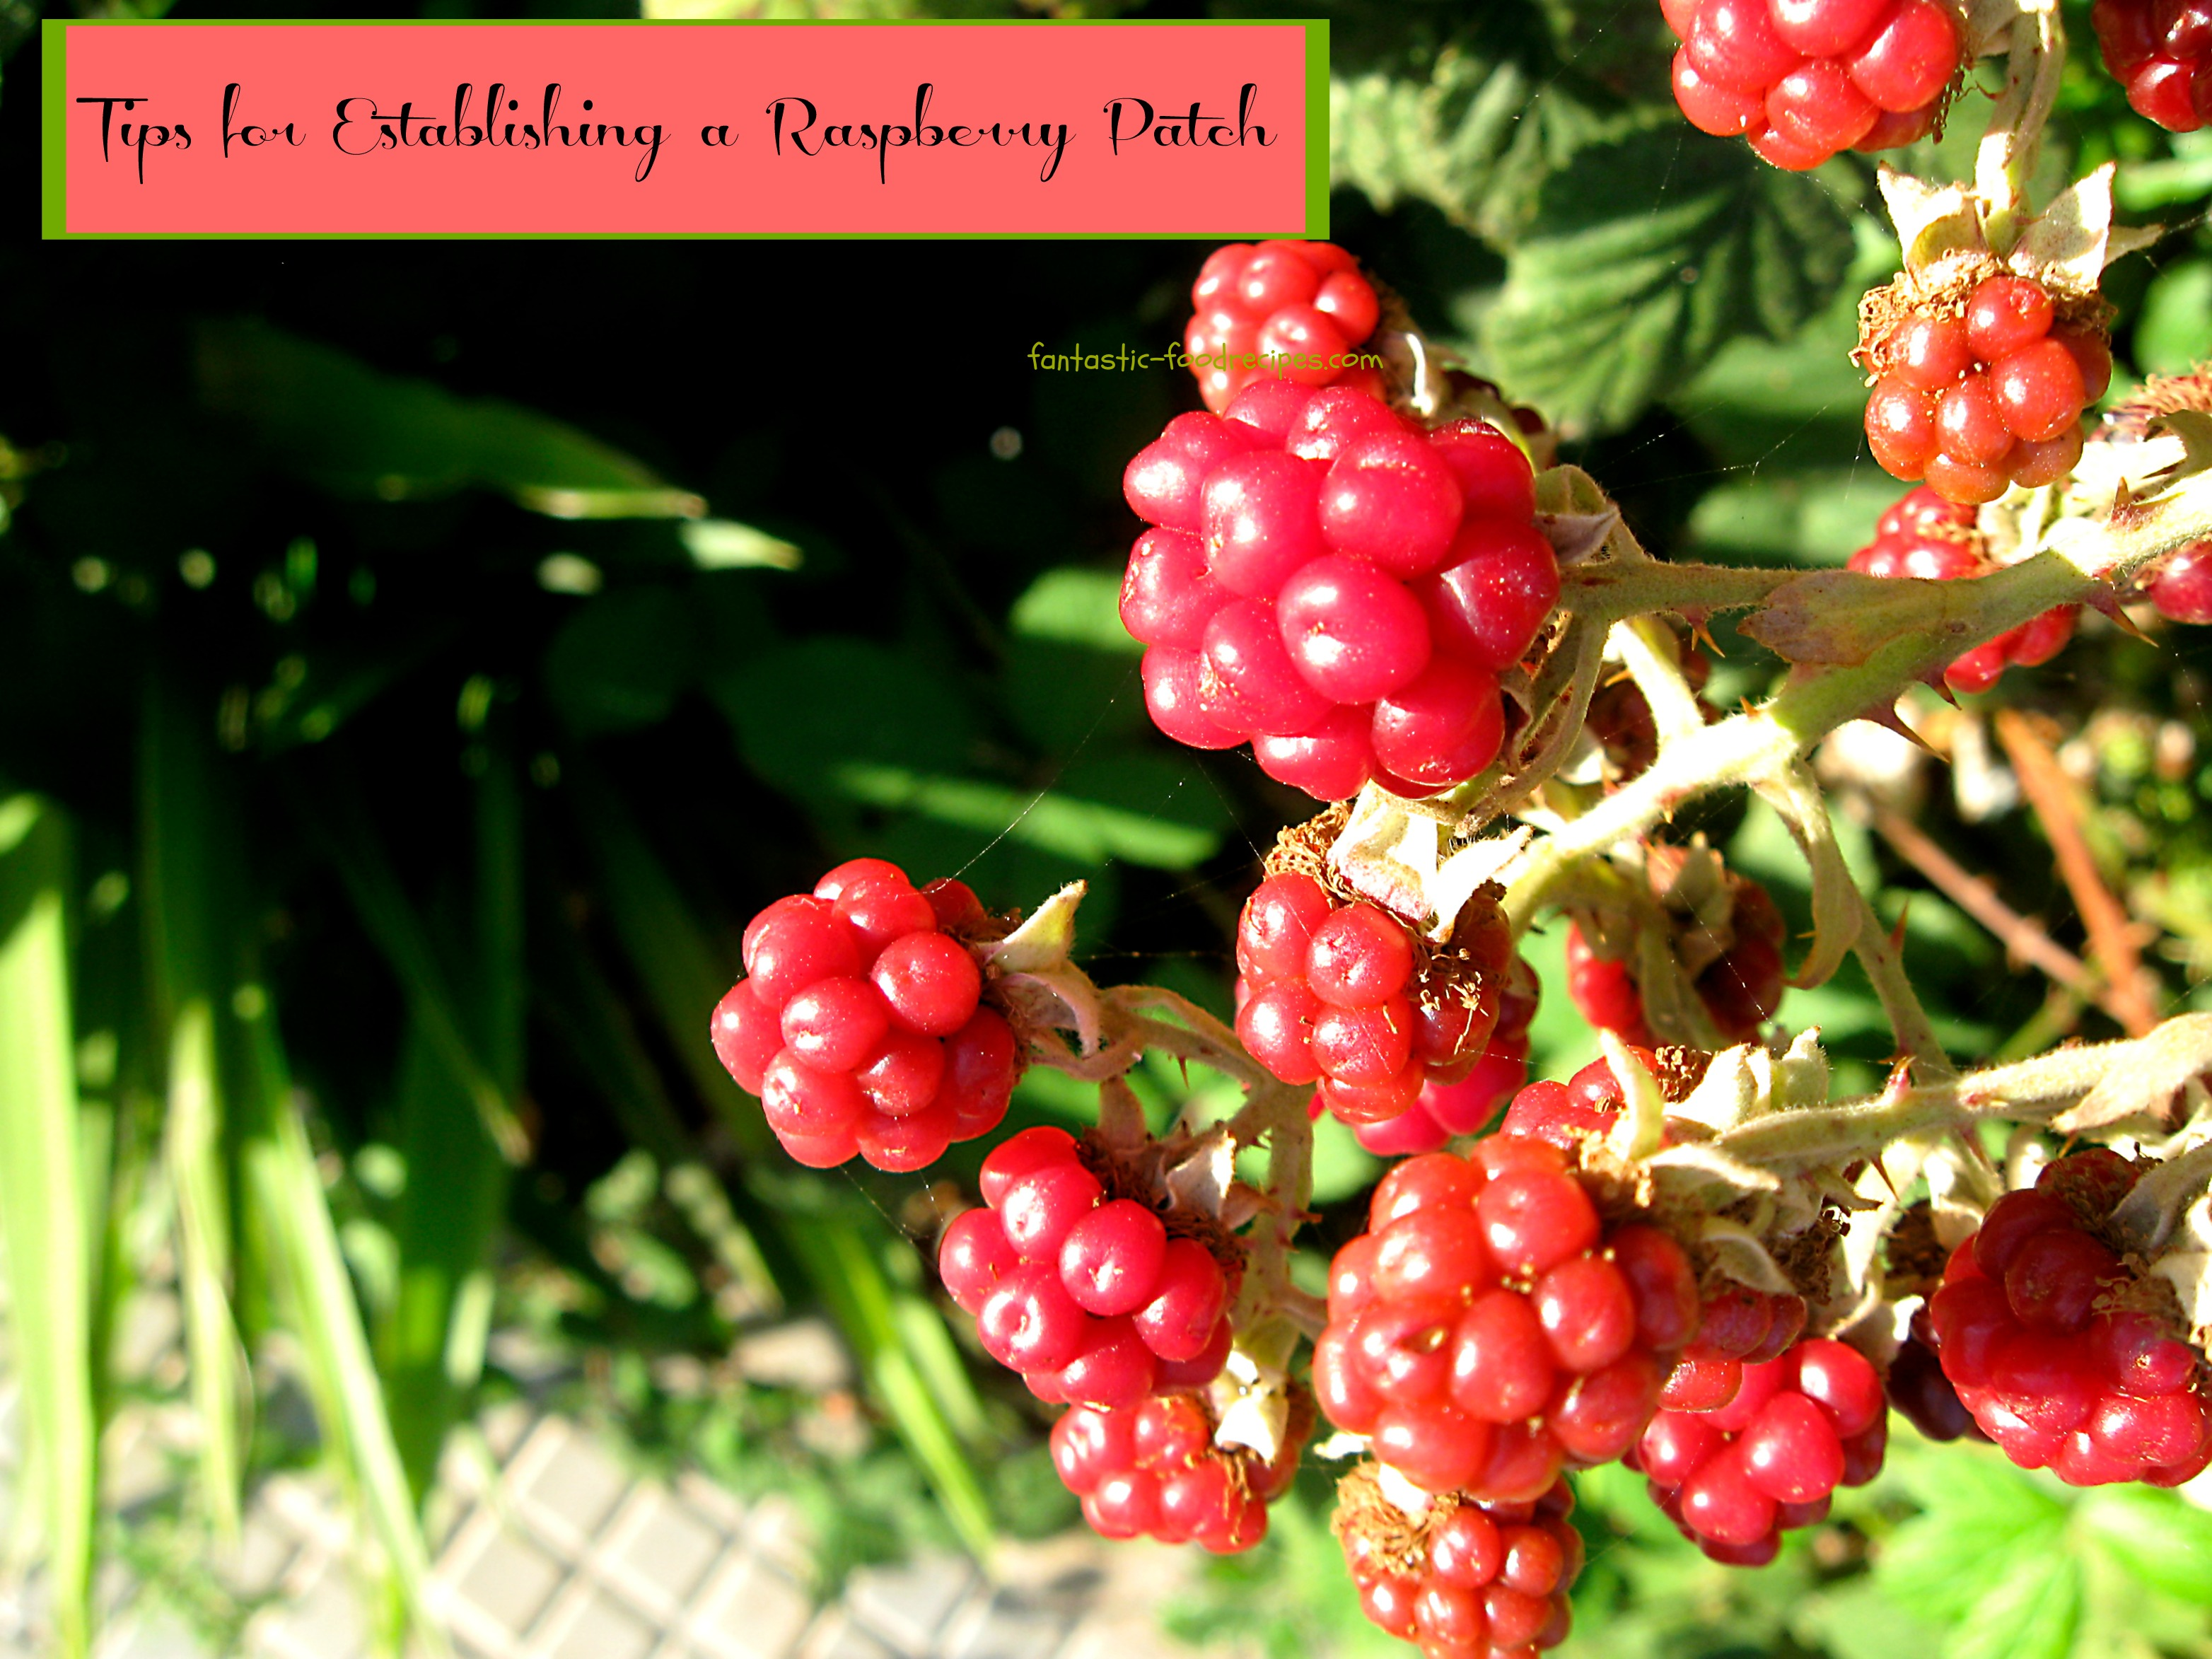 Tios for Establishing a Raspberry Patch